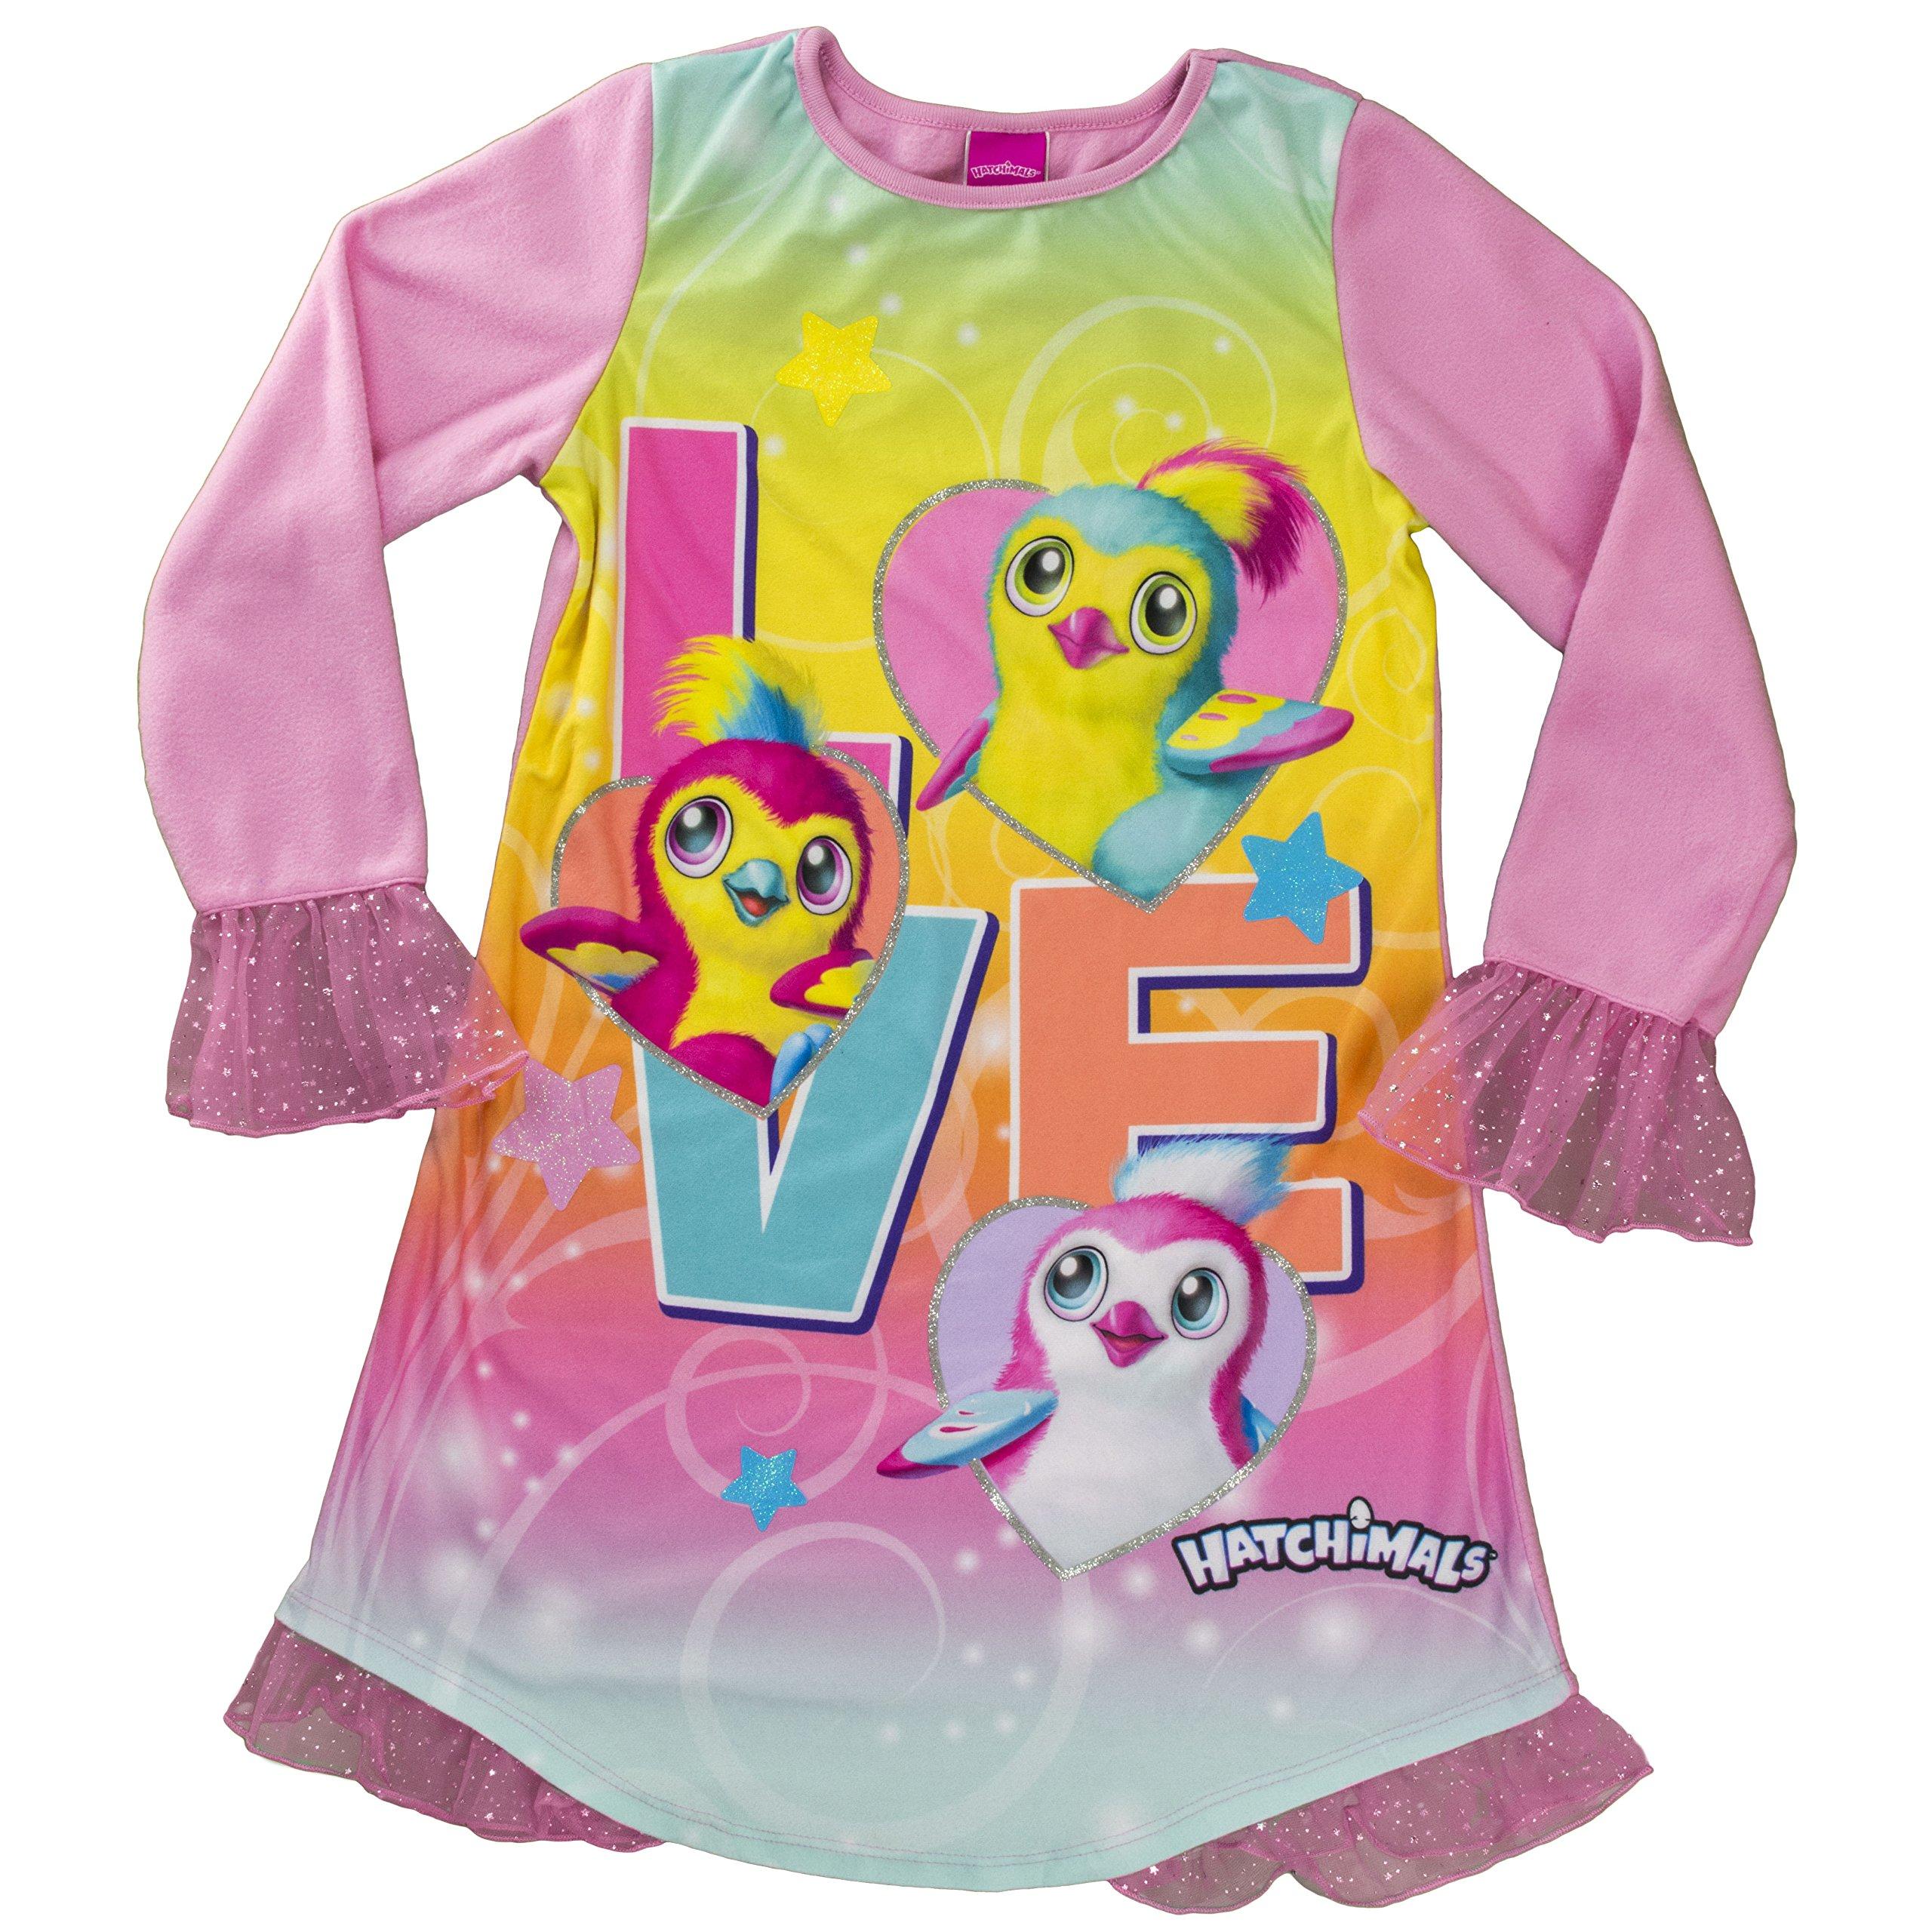 Hatchimals Little Girls' Night Shirt Sleep Dress Pajamas, Turquoise, 6/6X